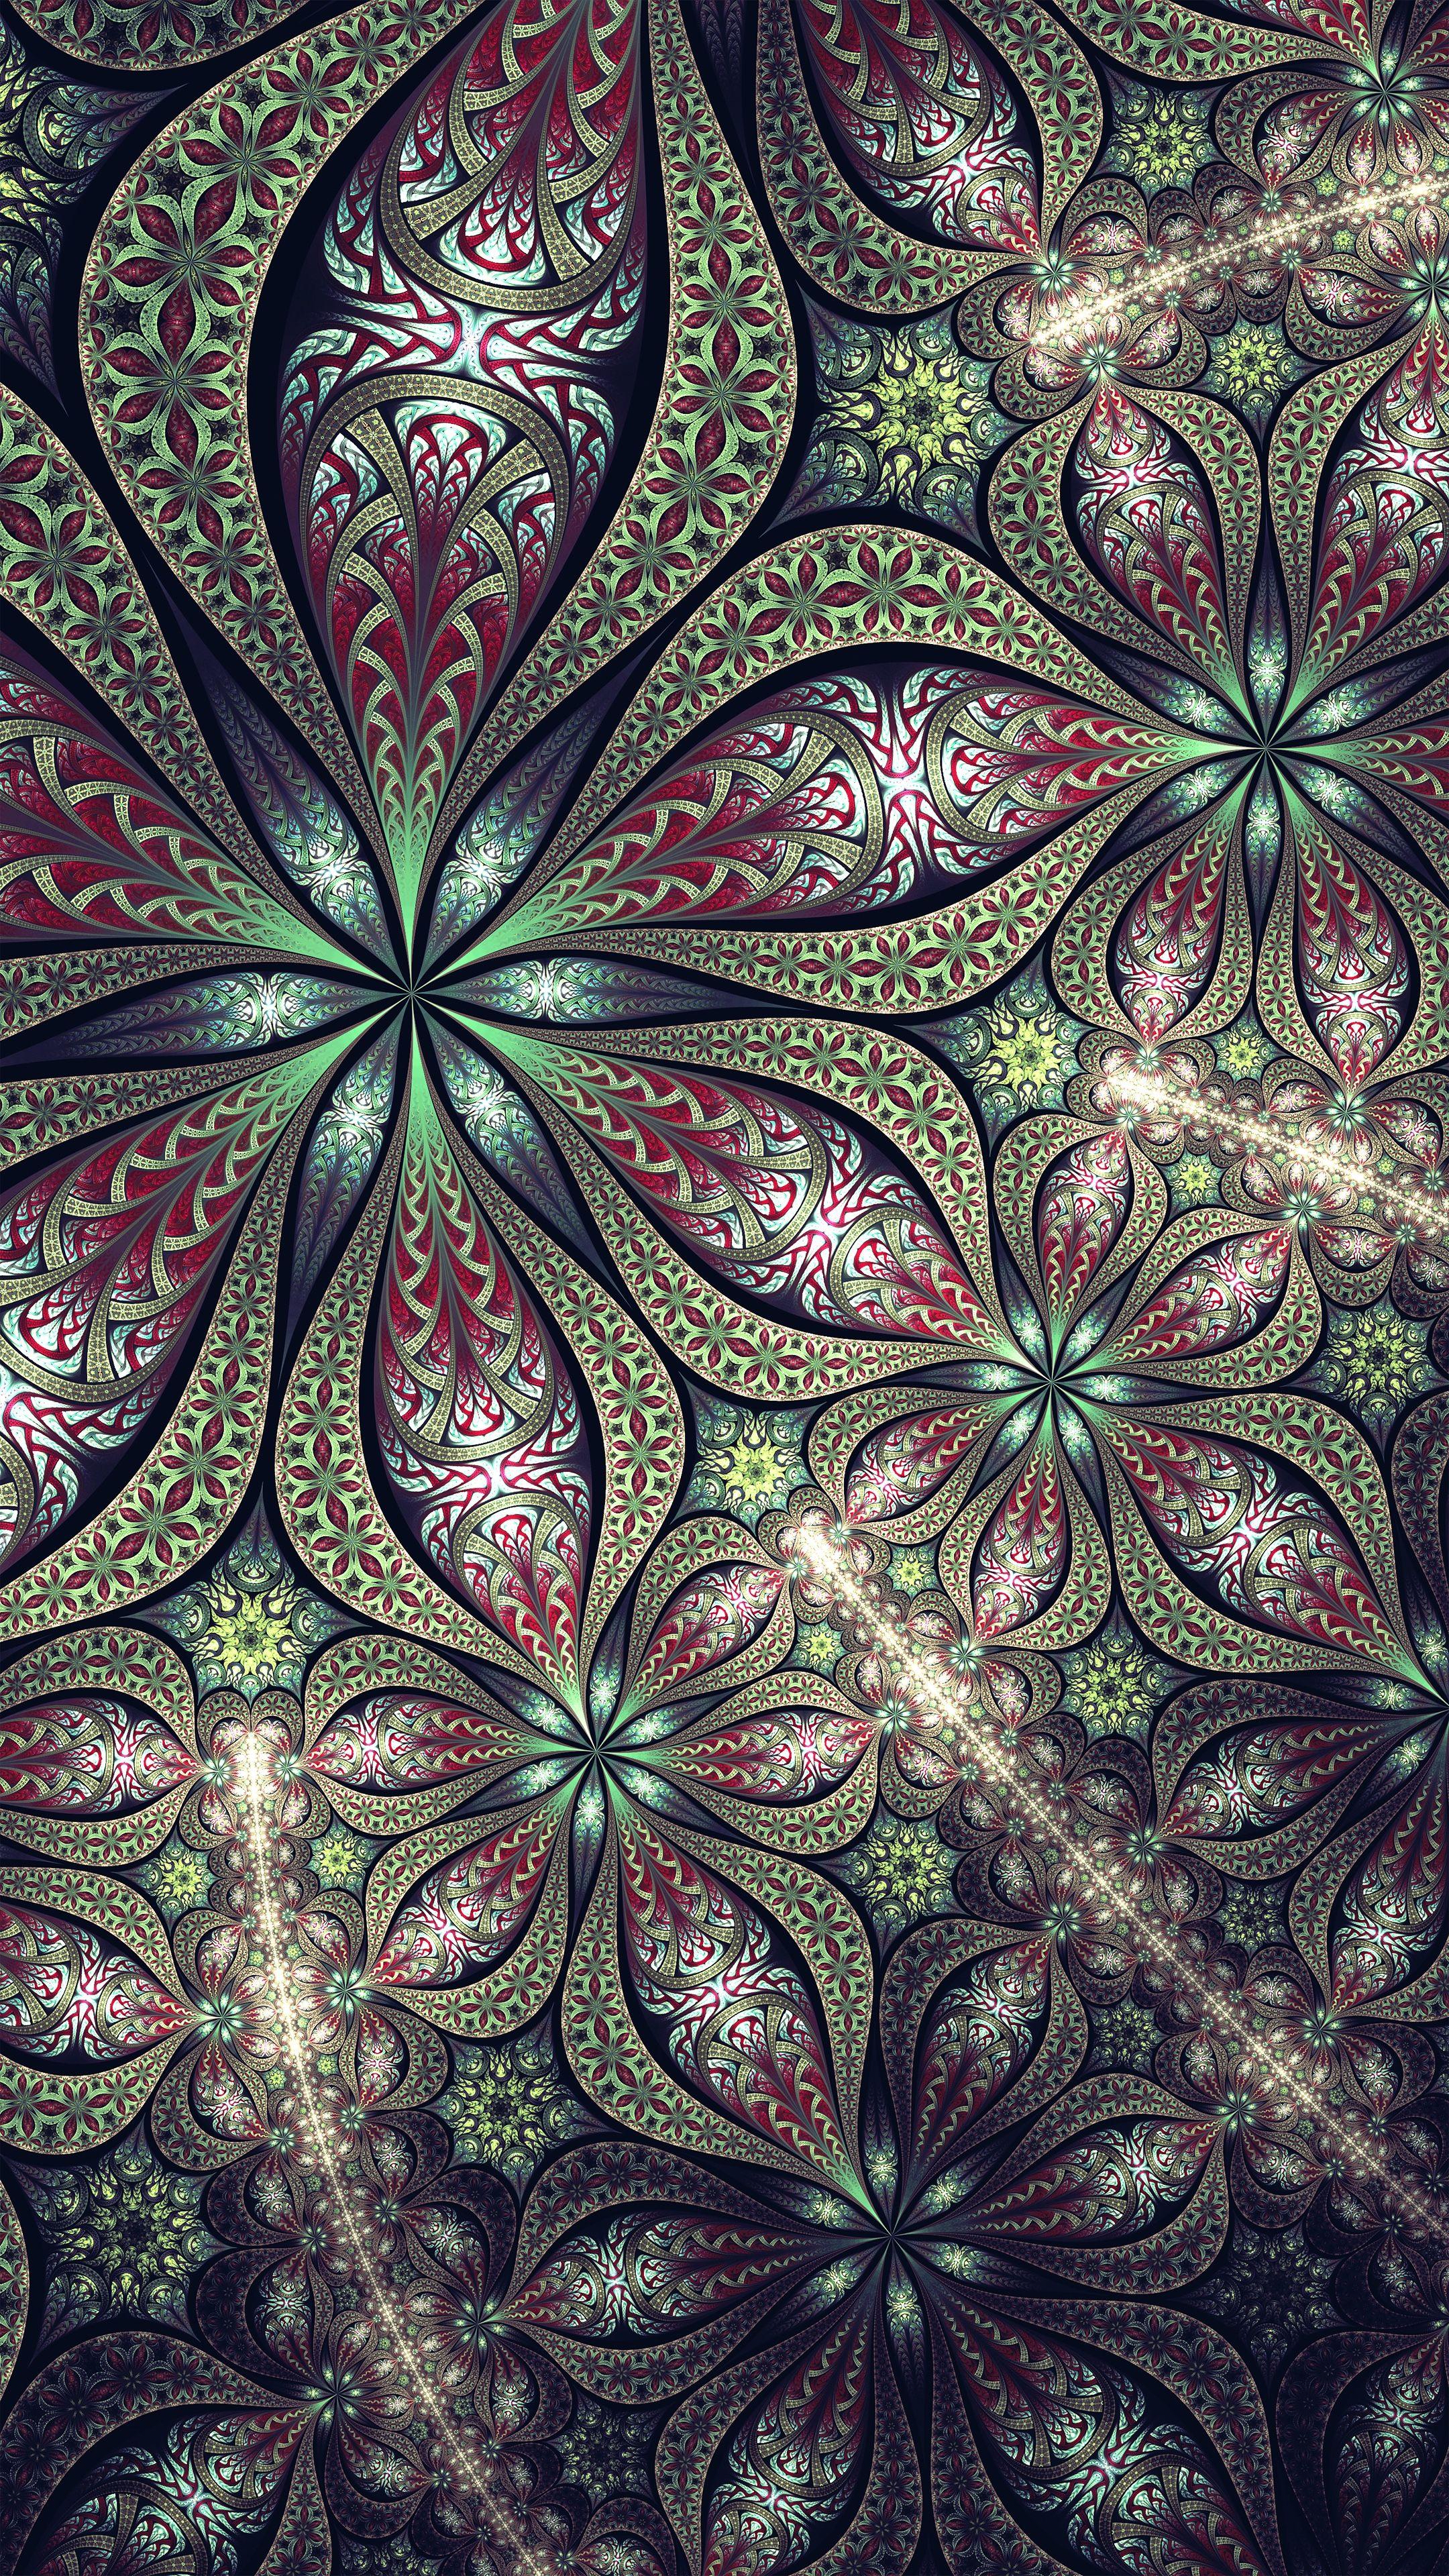 Feel Good Fractals Fractal Art Amazing Art Painting Illusion Art